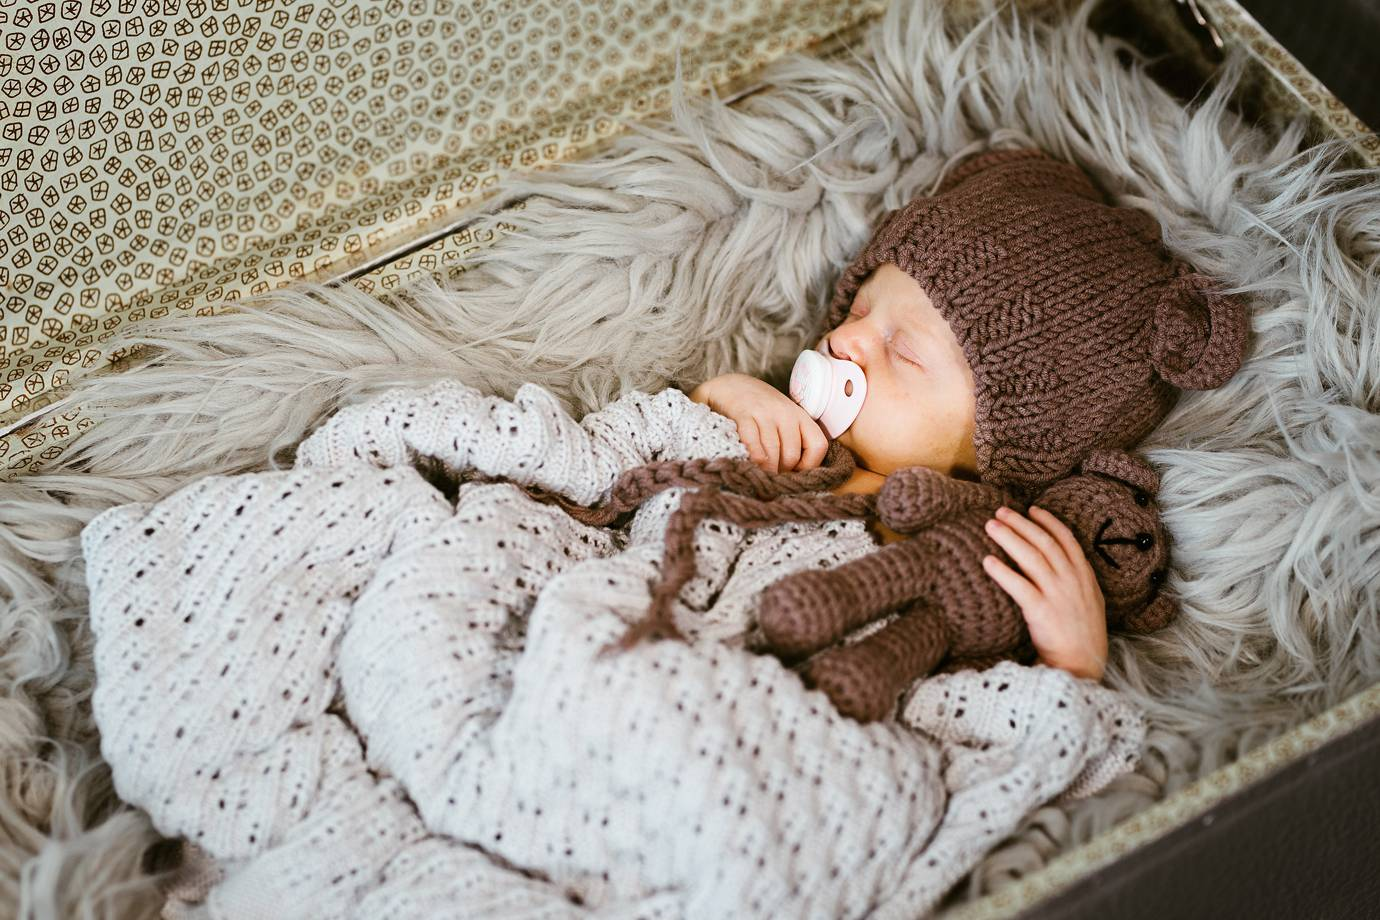 babyfotograf ritterhude 08 - Nika